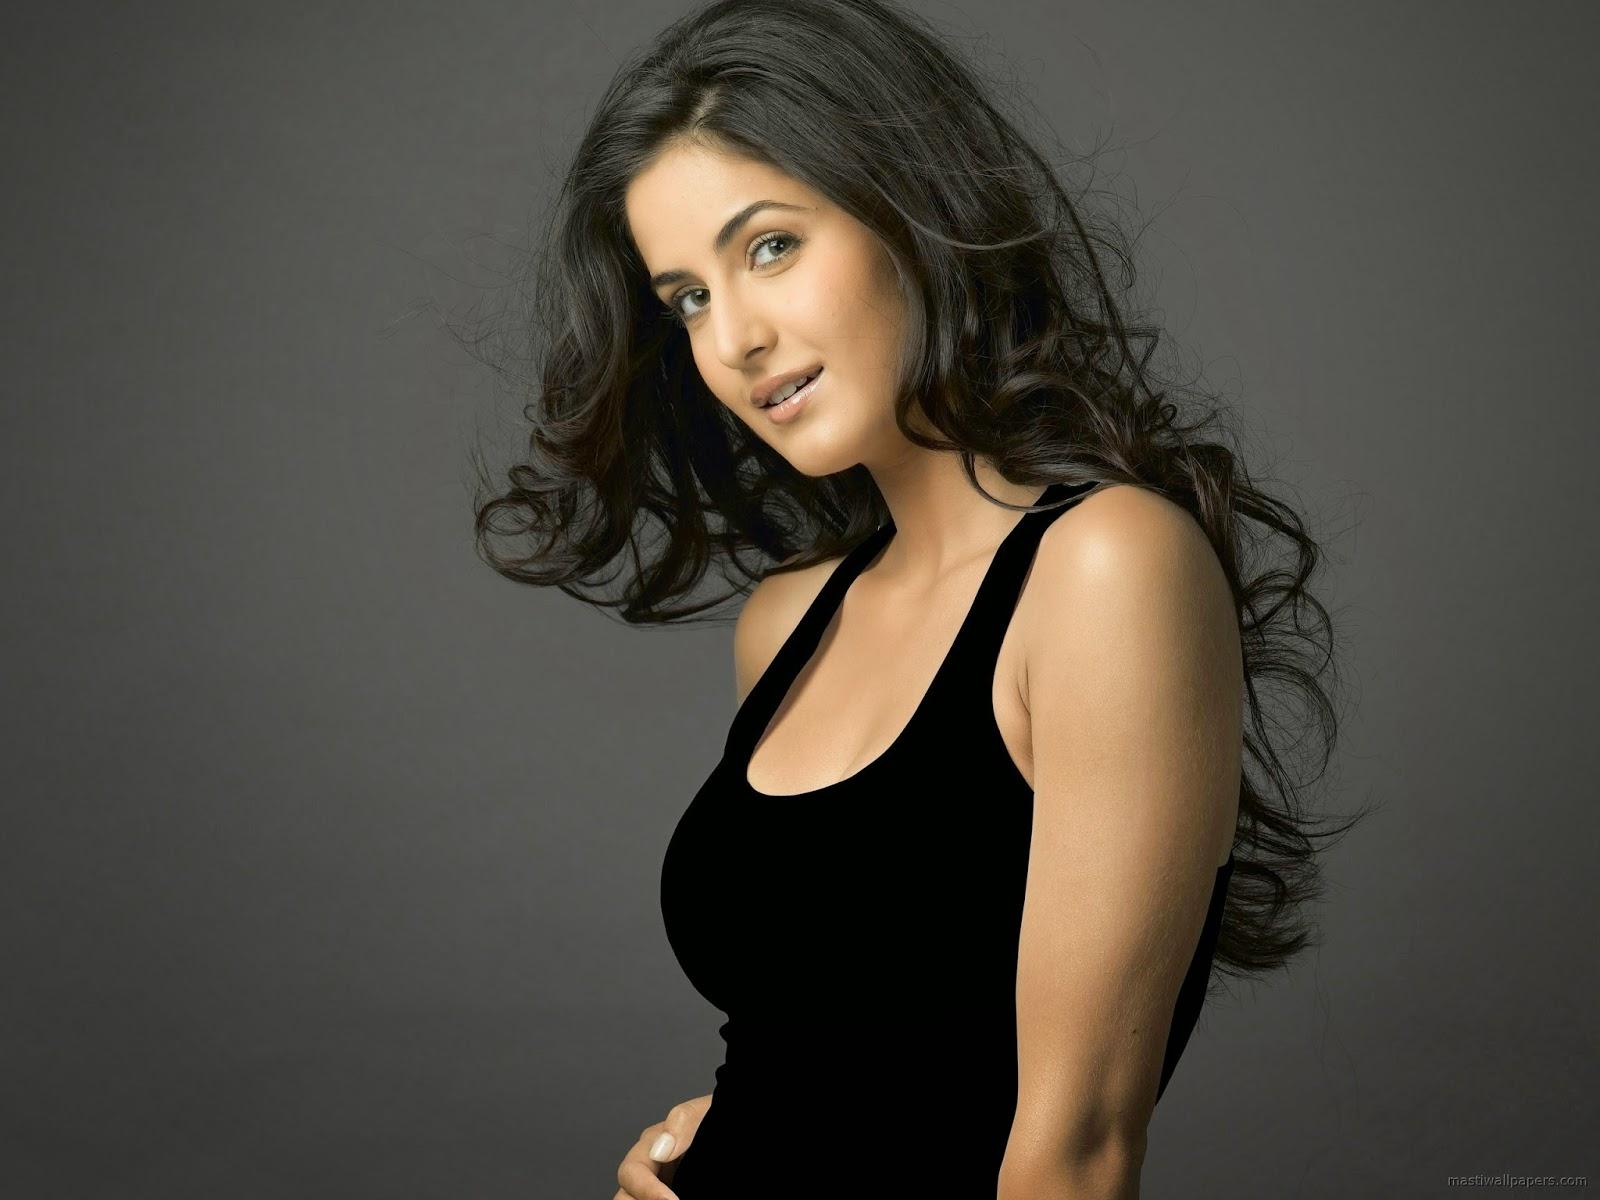 Katrina Kaif HD Wallpaper Widescreen Top Images